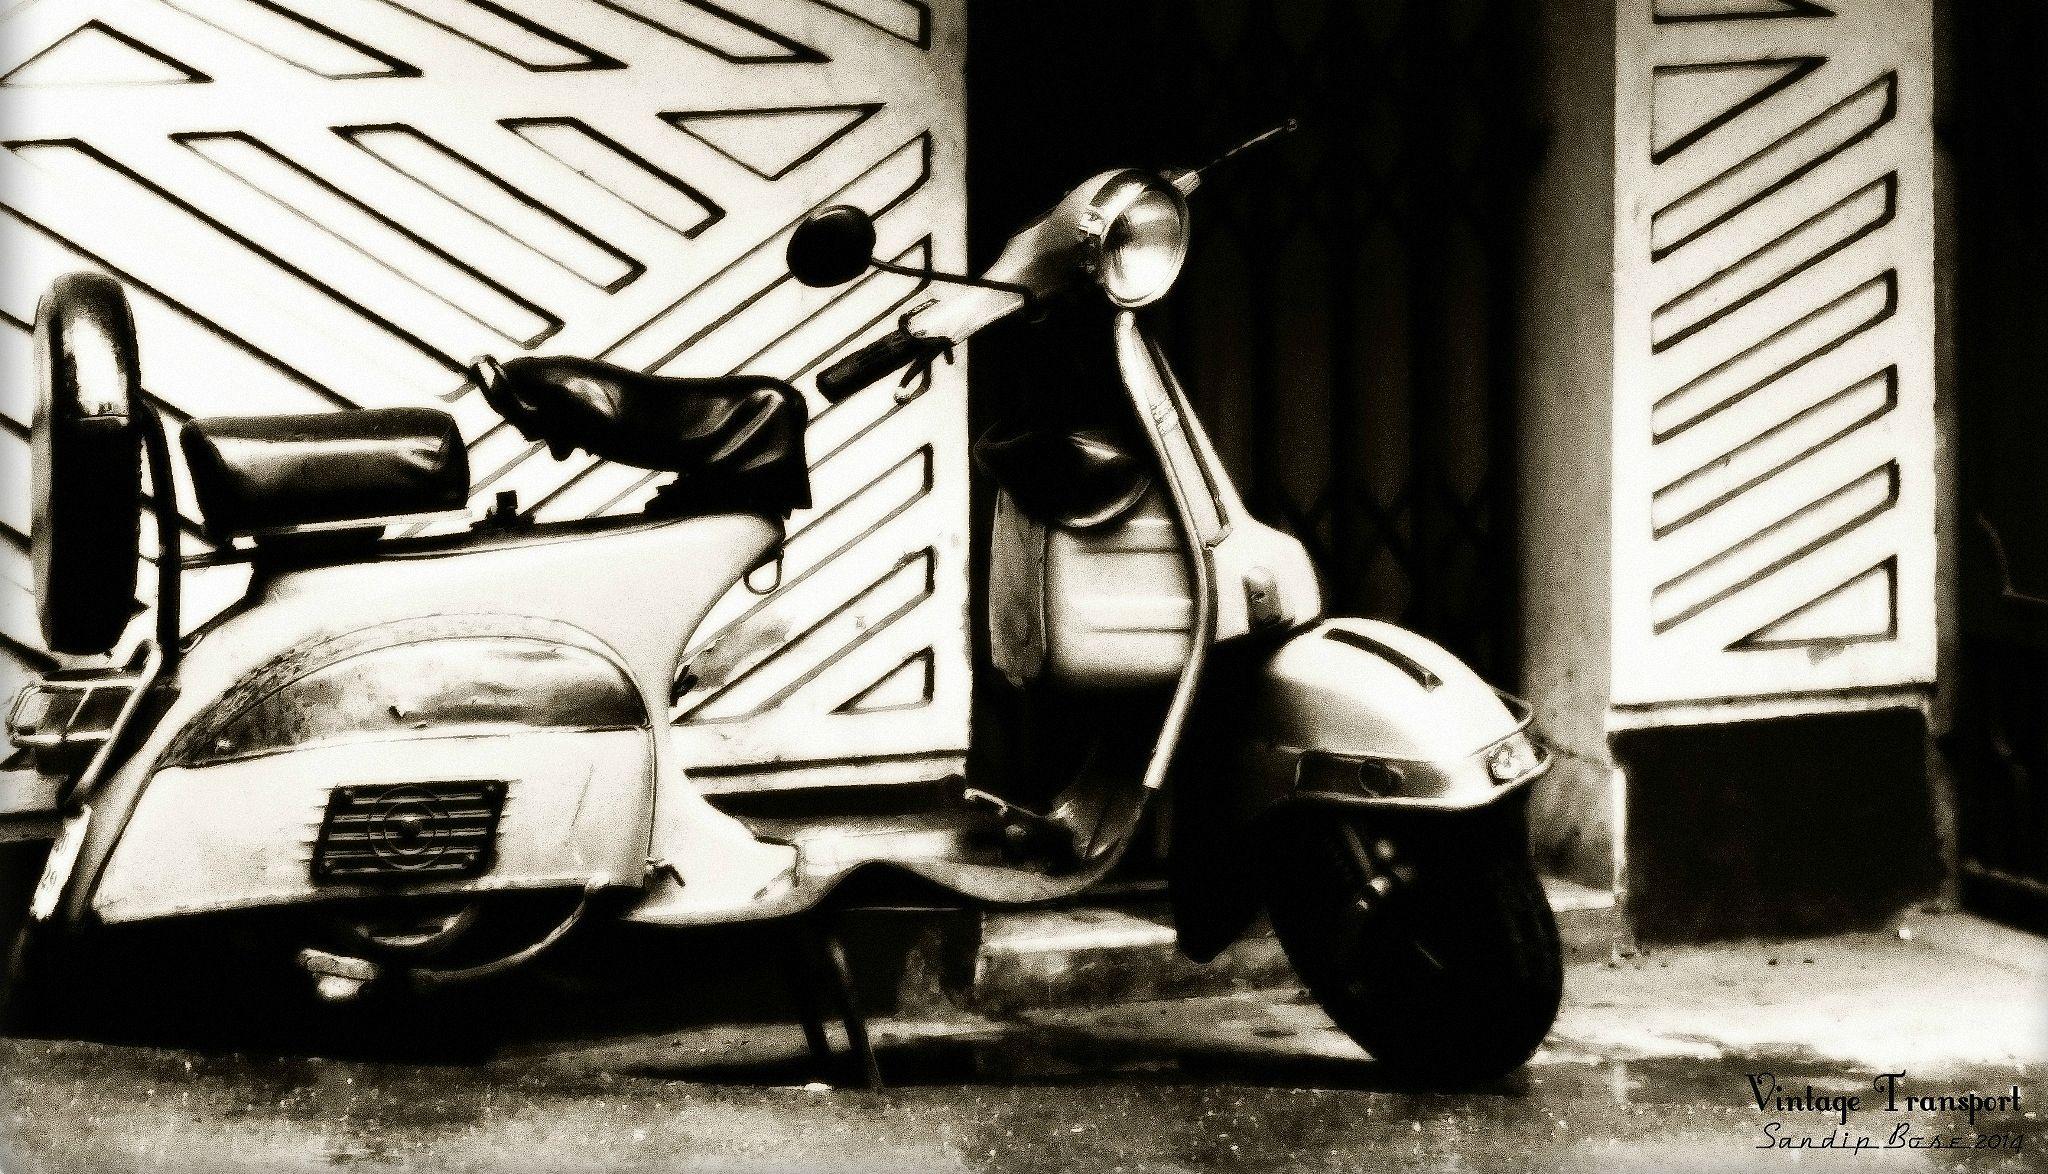 Vintage Transport by Sandip Bose on 500px